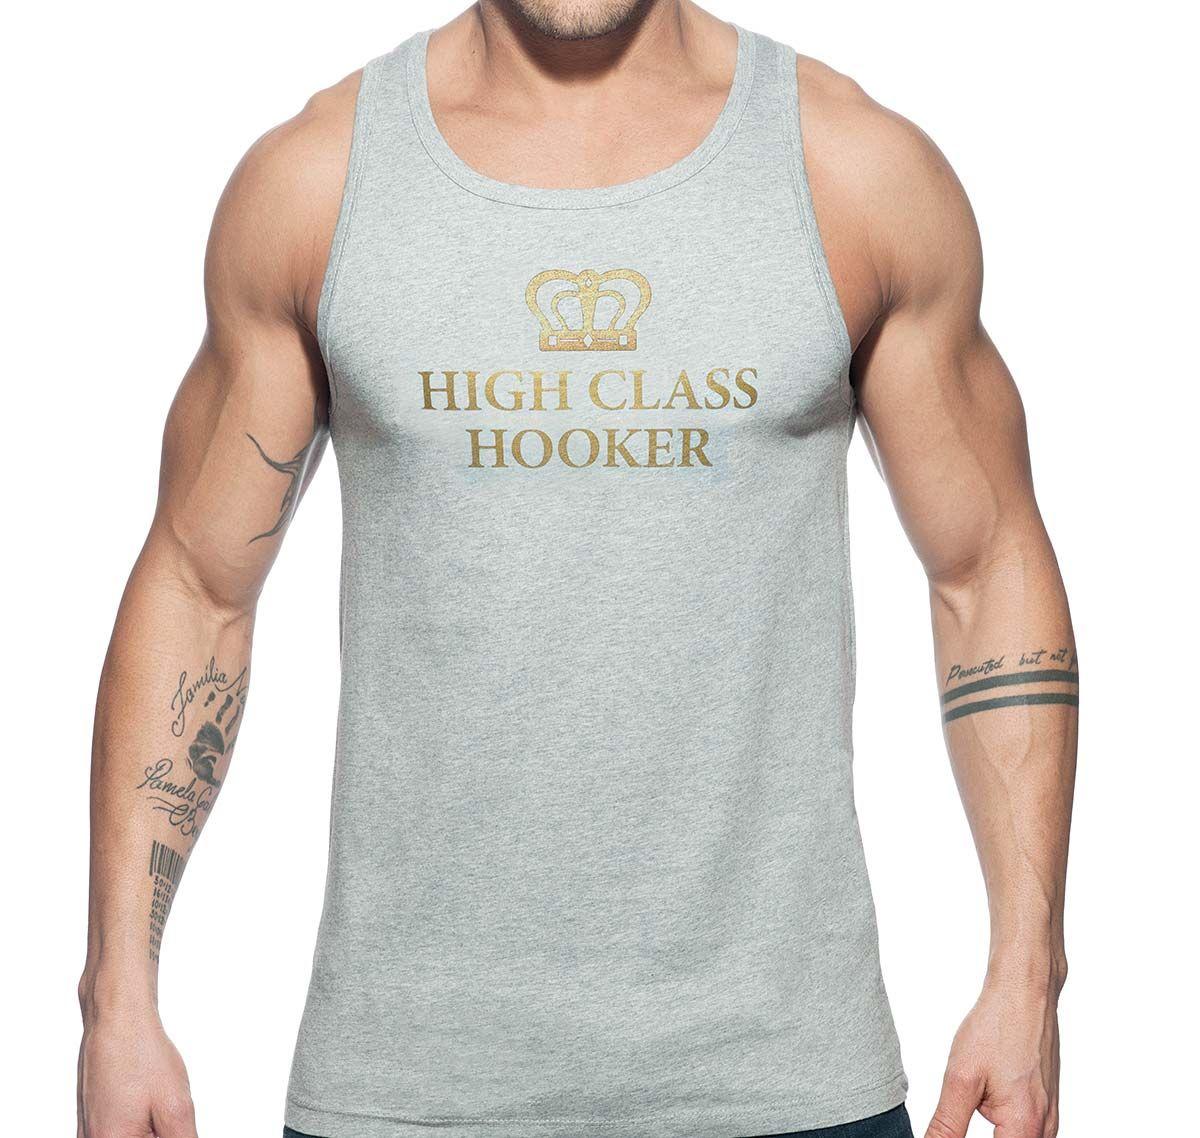 Addicted Canotta HIGH CLASS HOOKER TANK TOP AD646, grigio